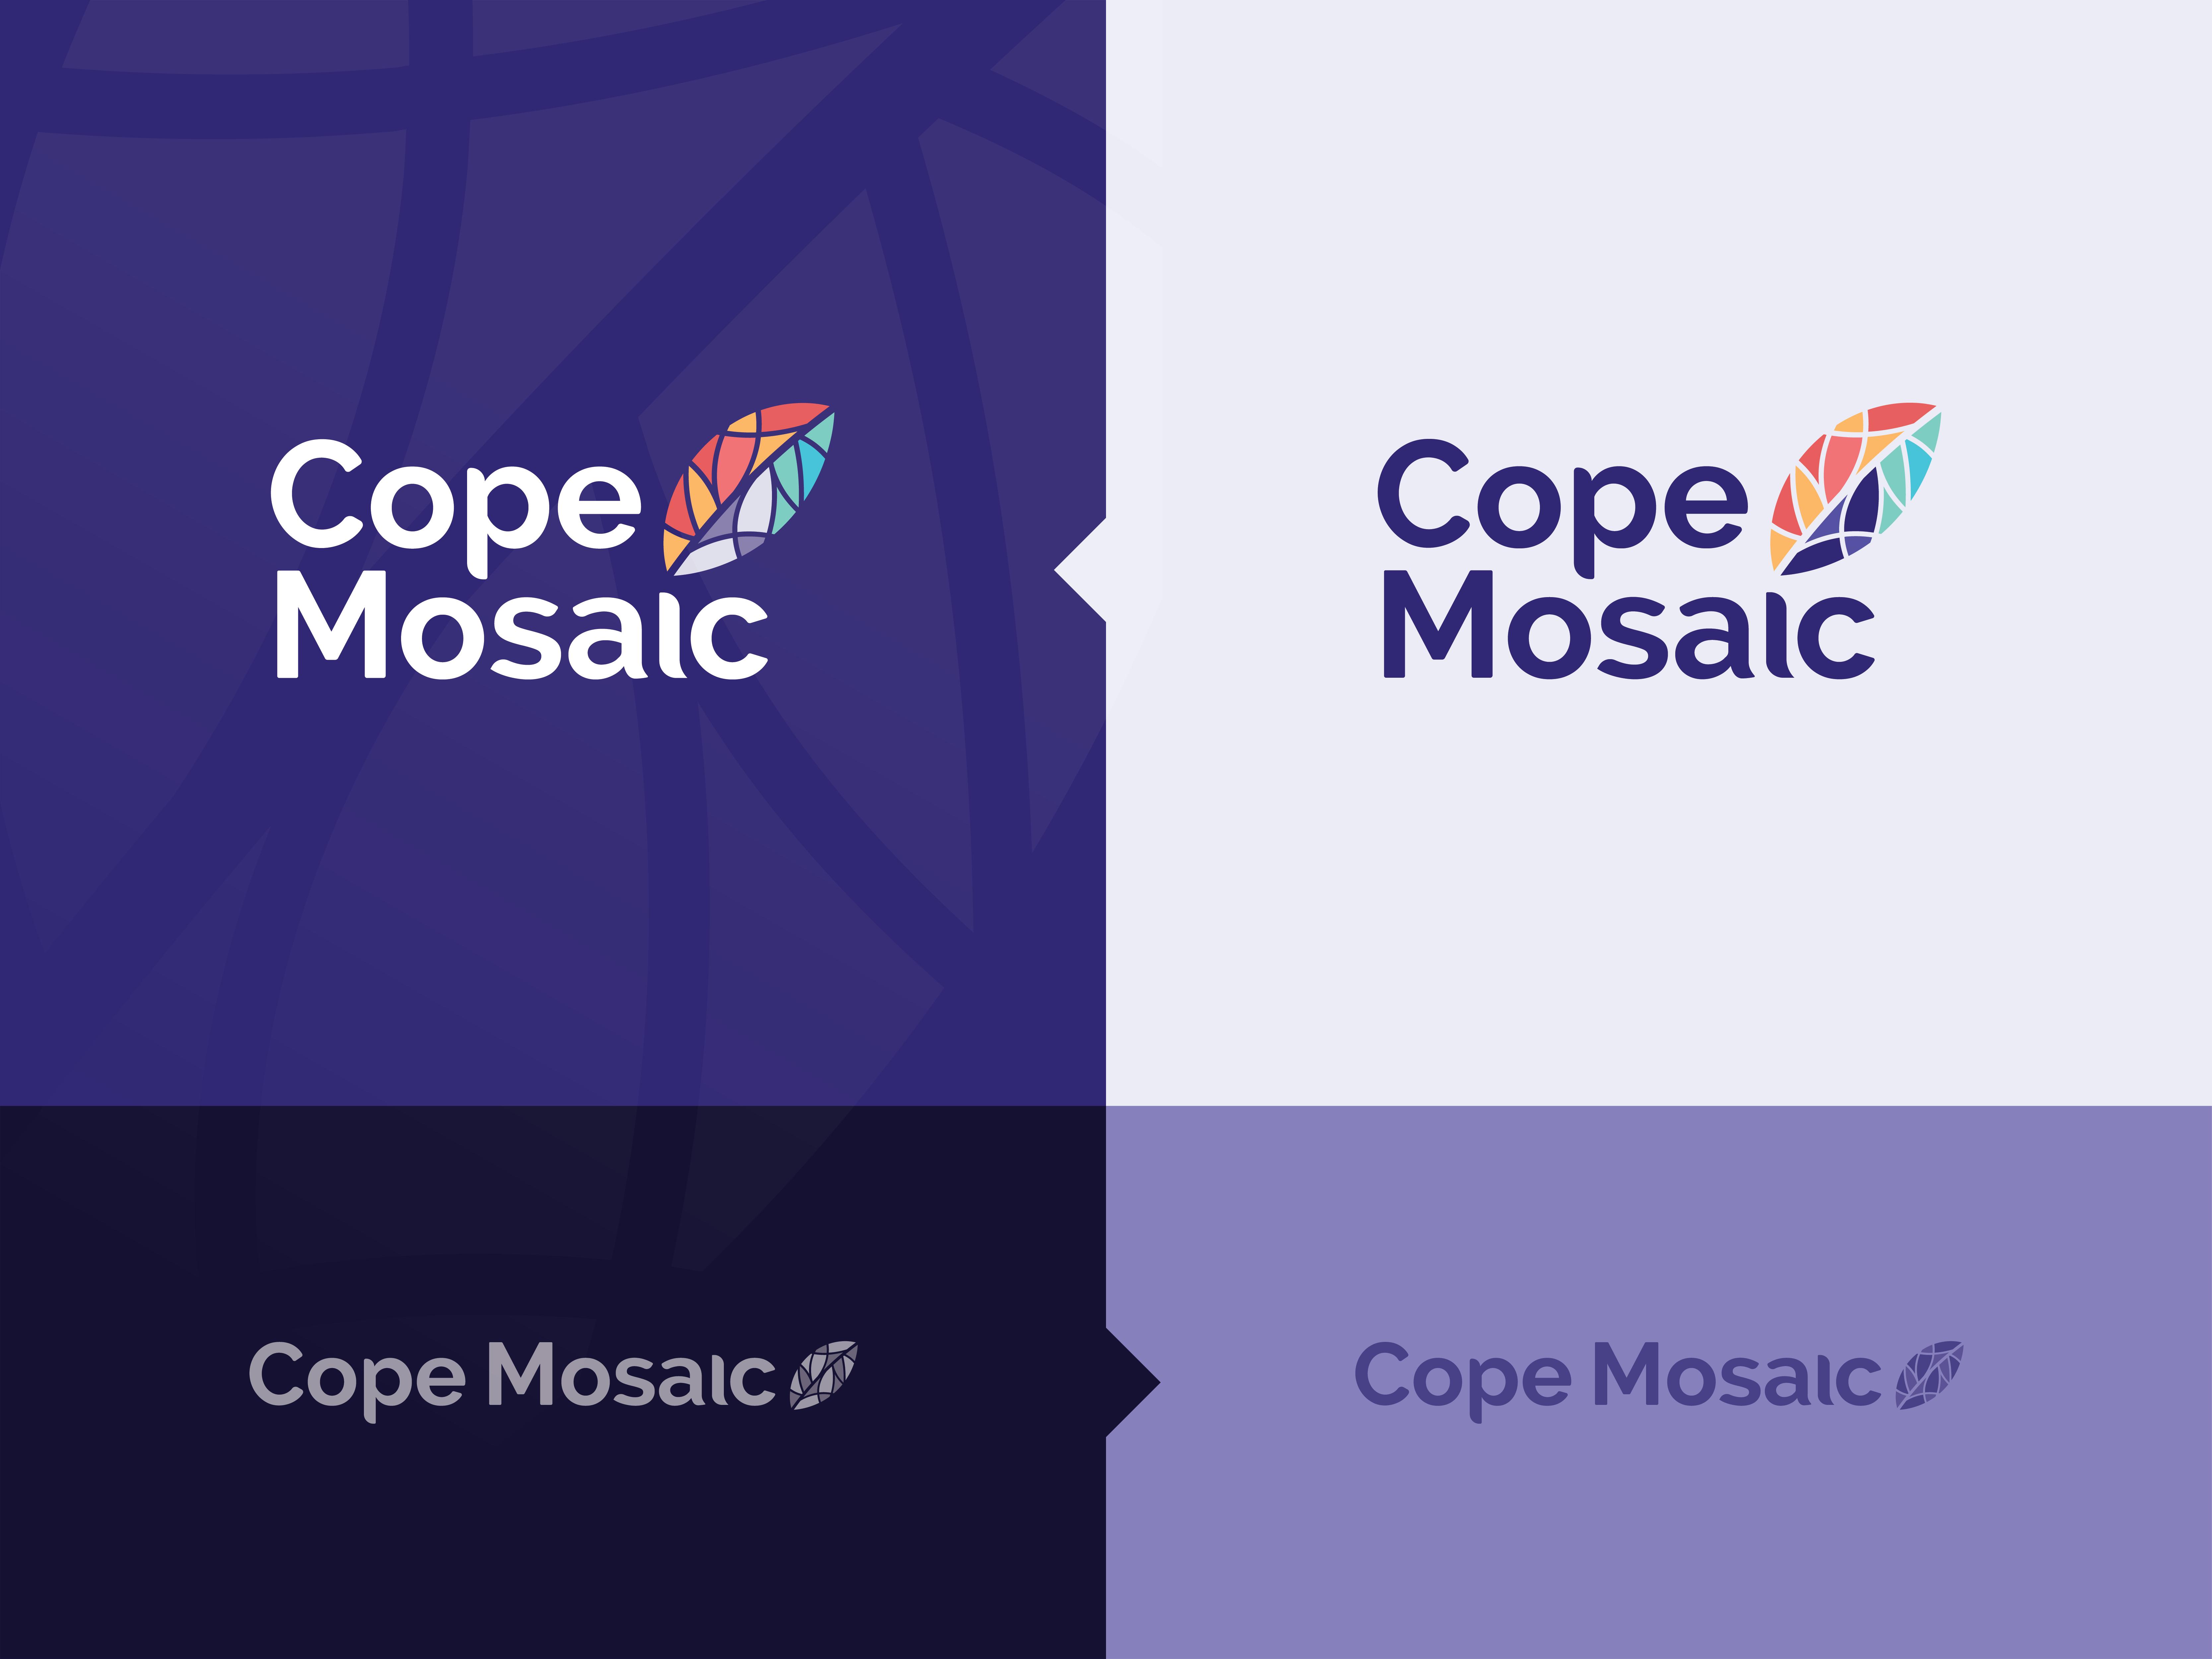 Cope mosaic